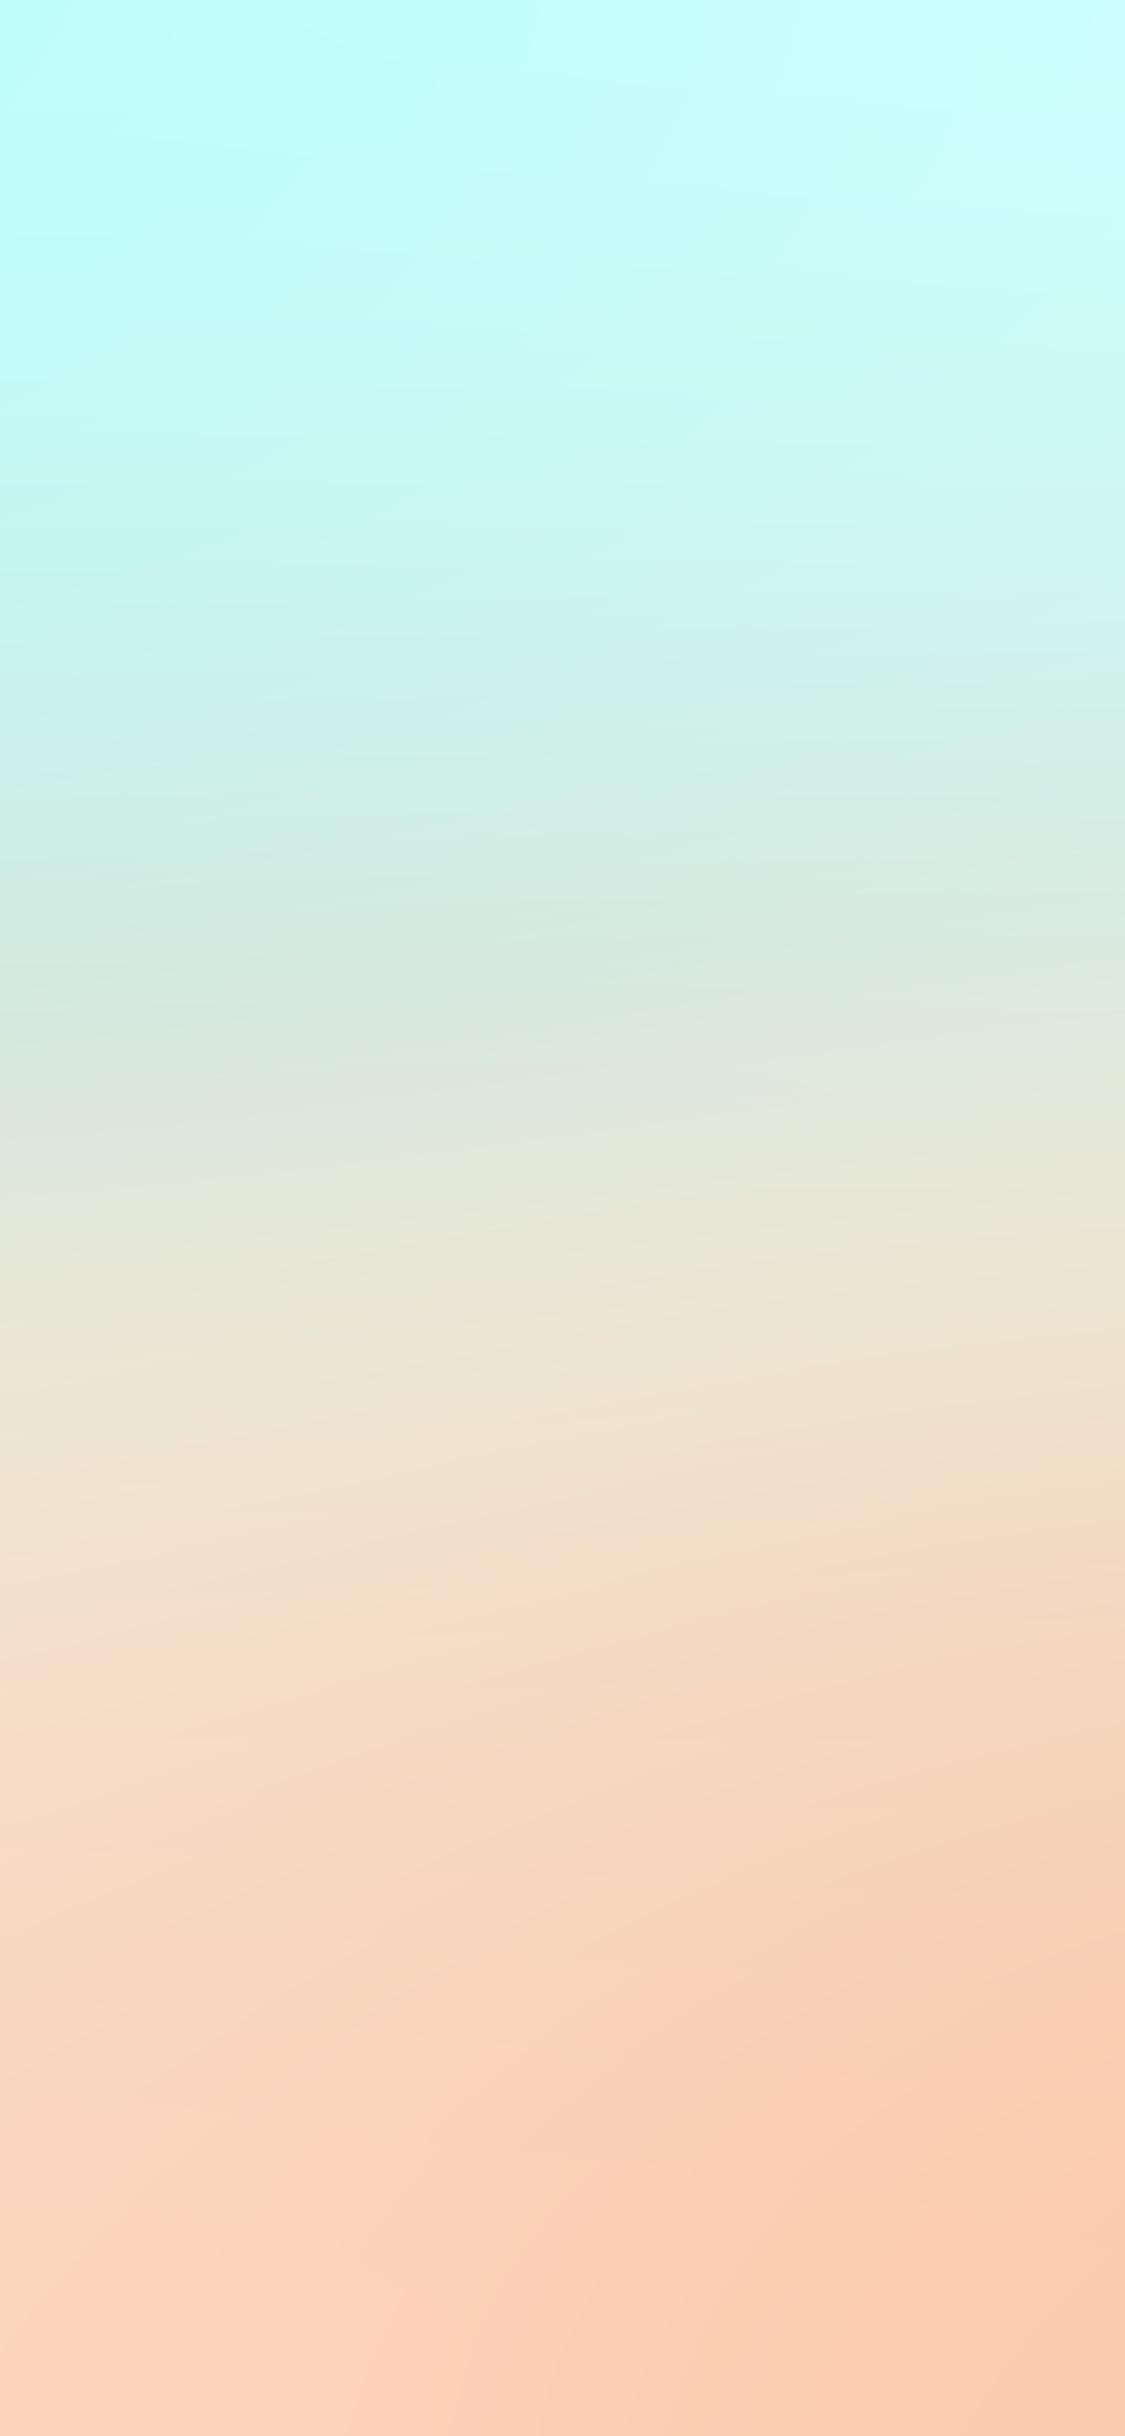 iPhonexpapers.com-Apple-iPhone-wallpaper-sn87-soft-pink-pastel-blur-gradation